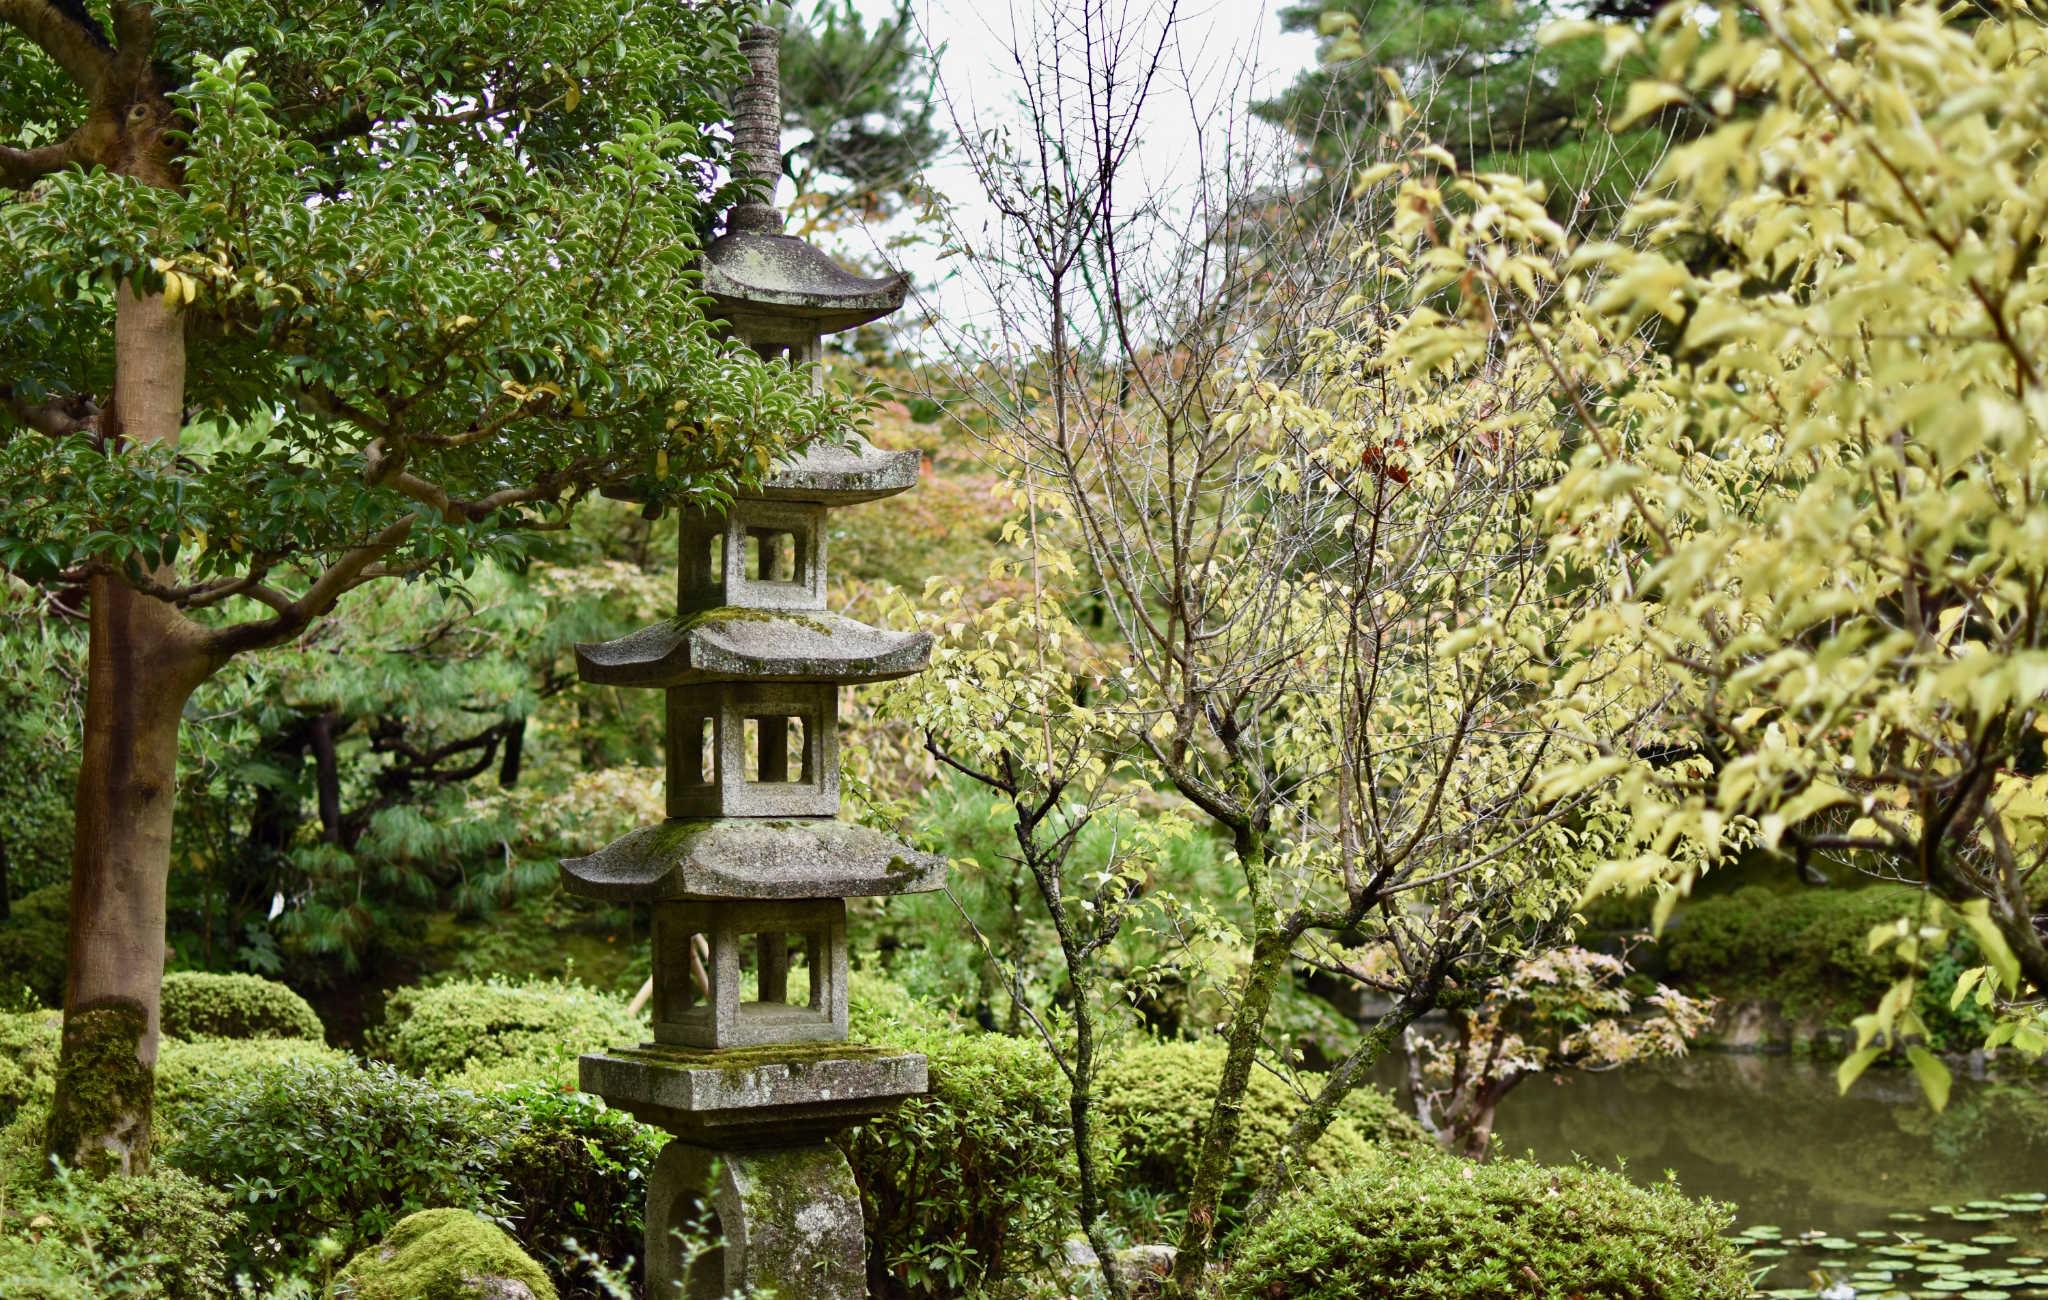 Pagode de granit au milieu des arbres